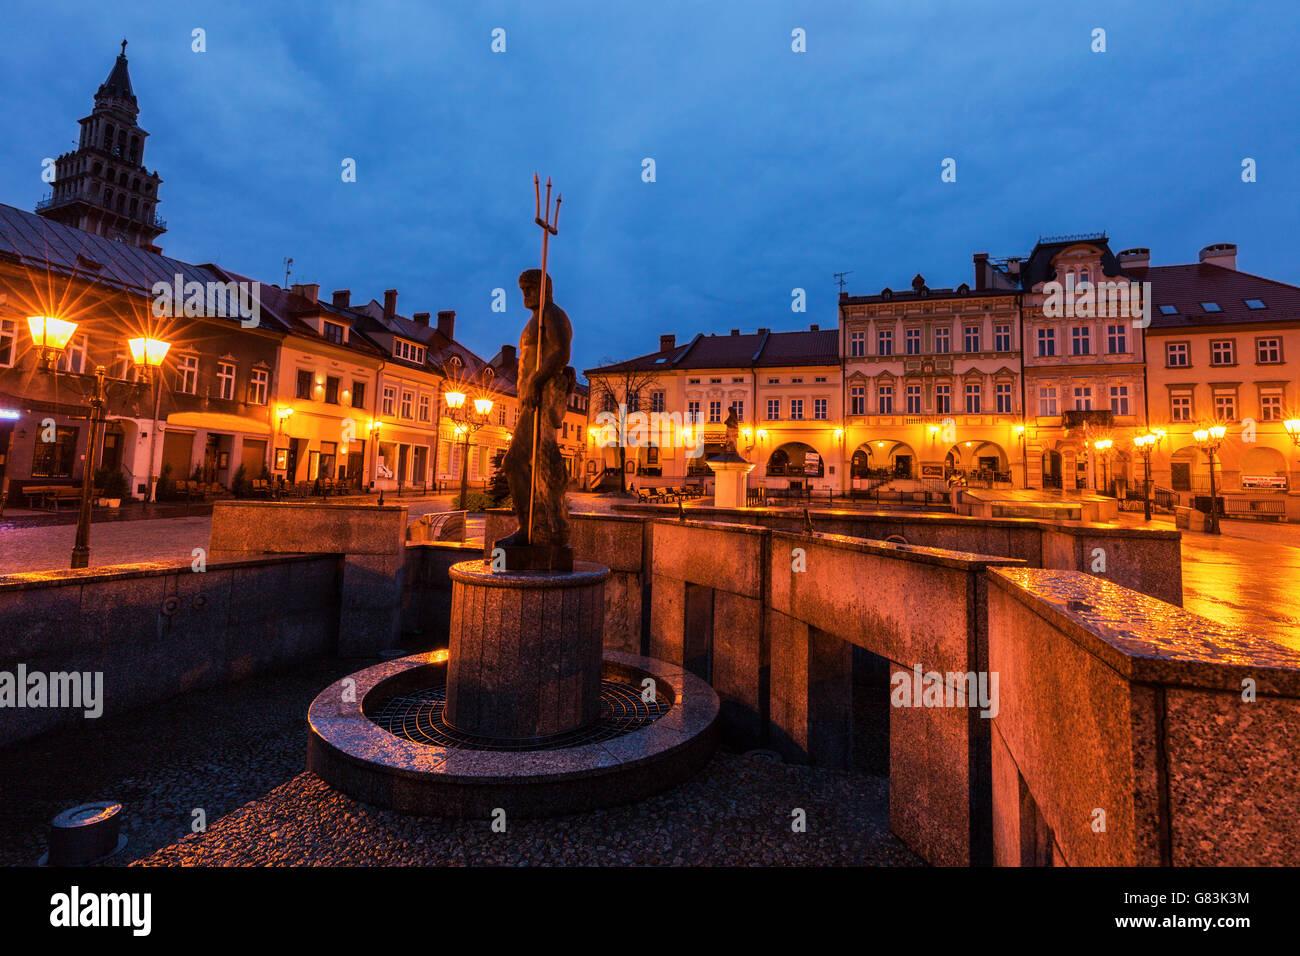 Neptun Fountain on Main Square in Bielsko-Biala - Stock Image